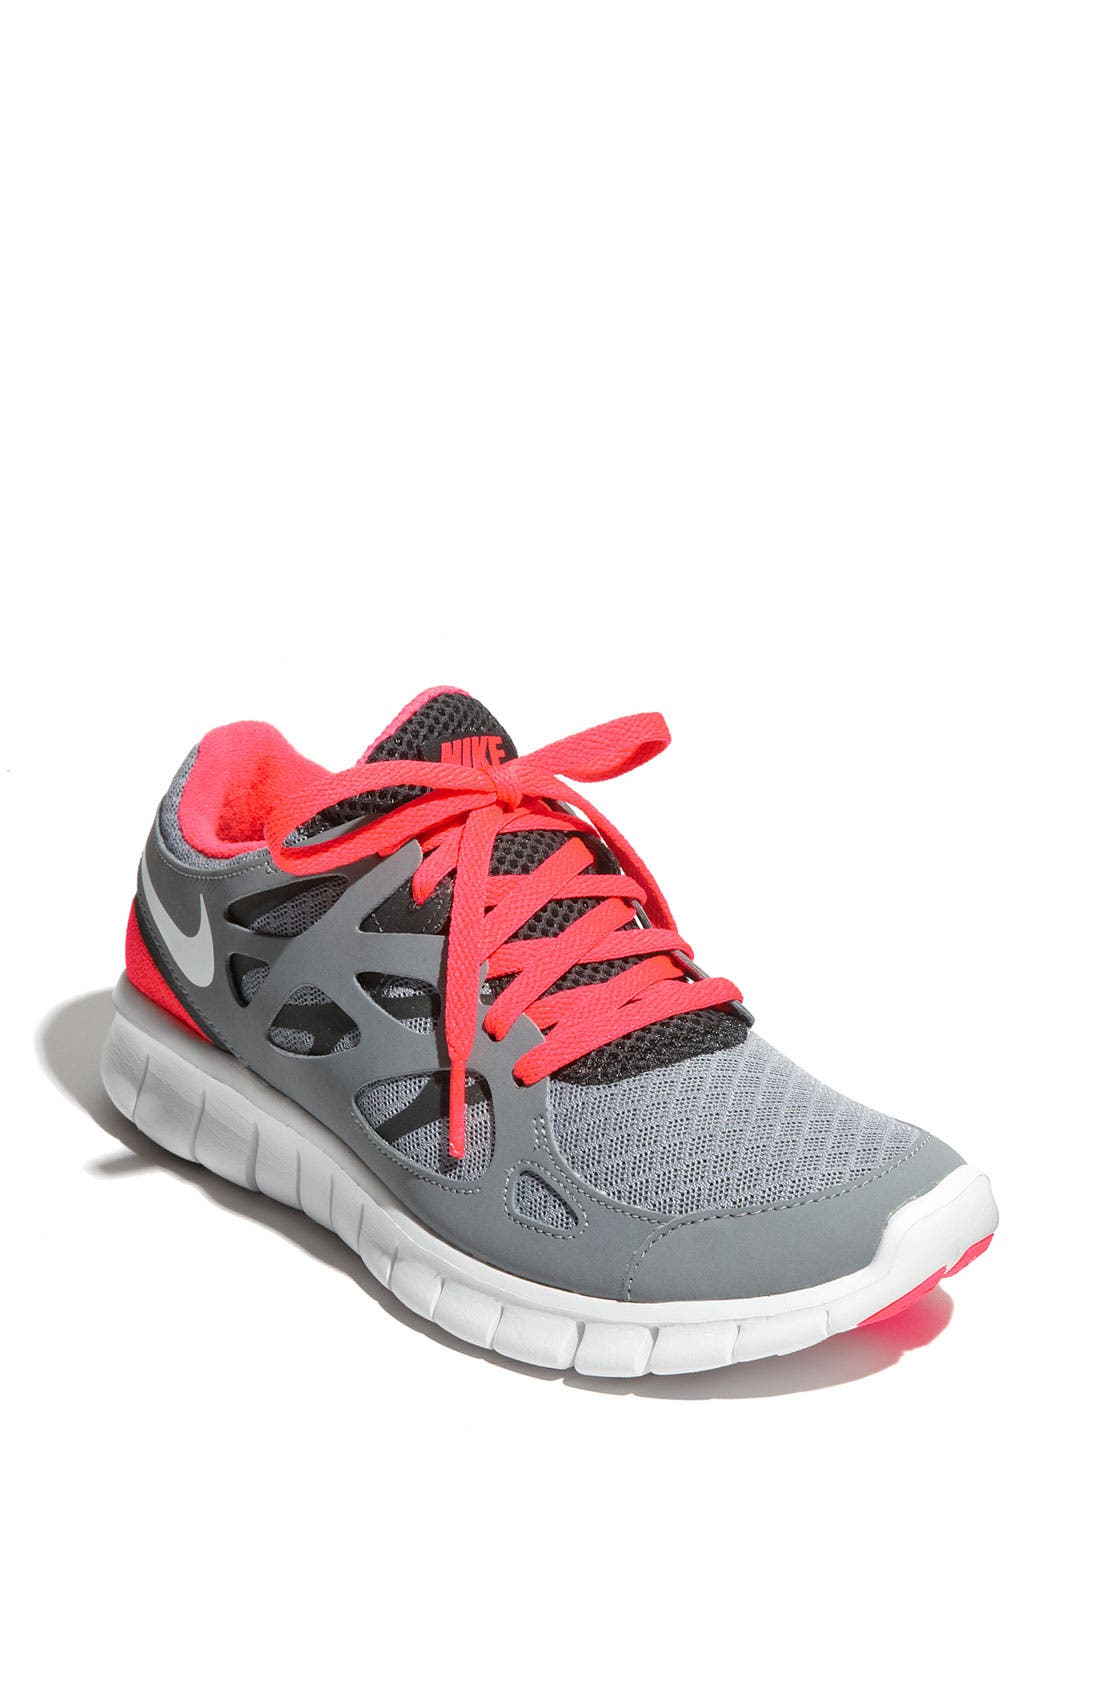 Main Image - Nike 'Free Run 2+' Running Shoe (Women)